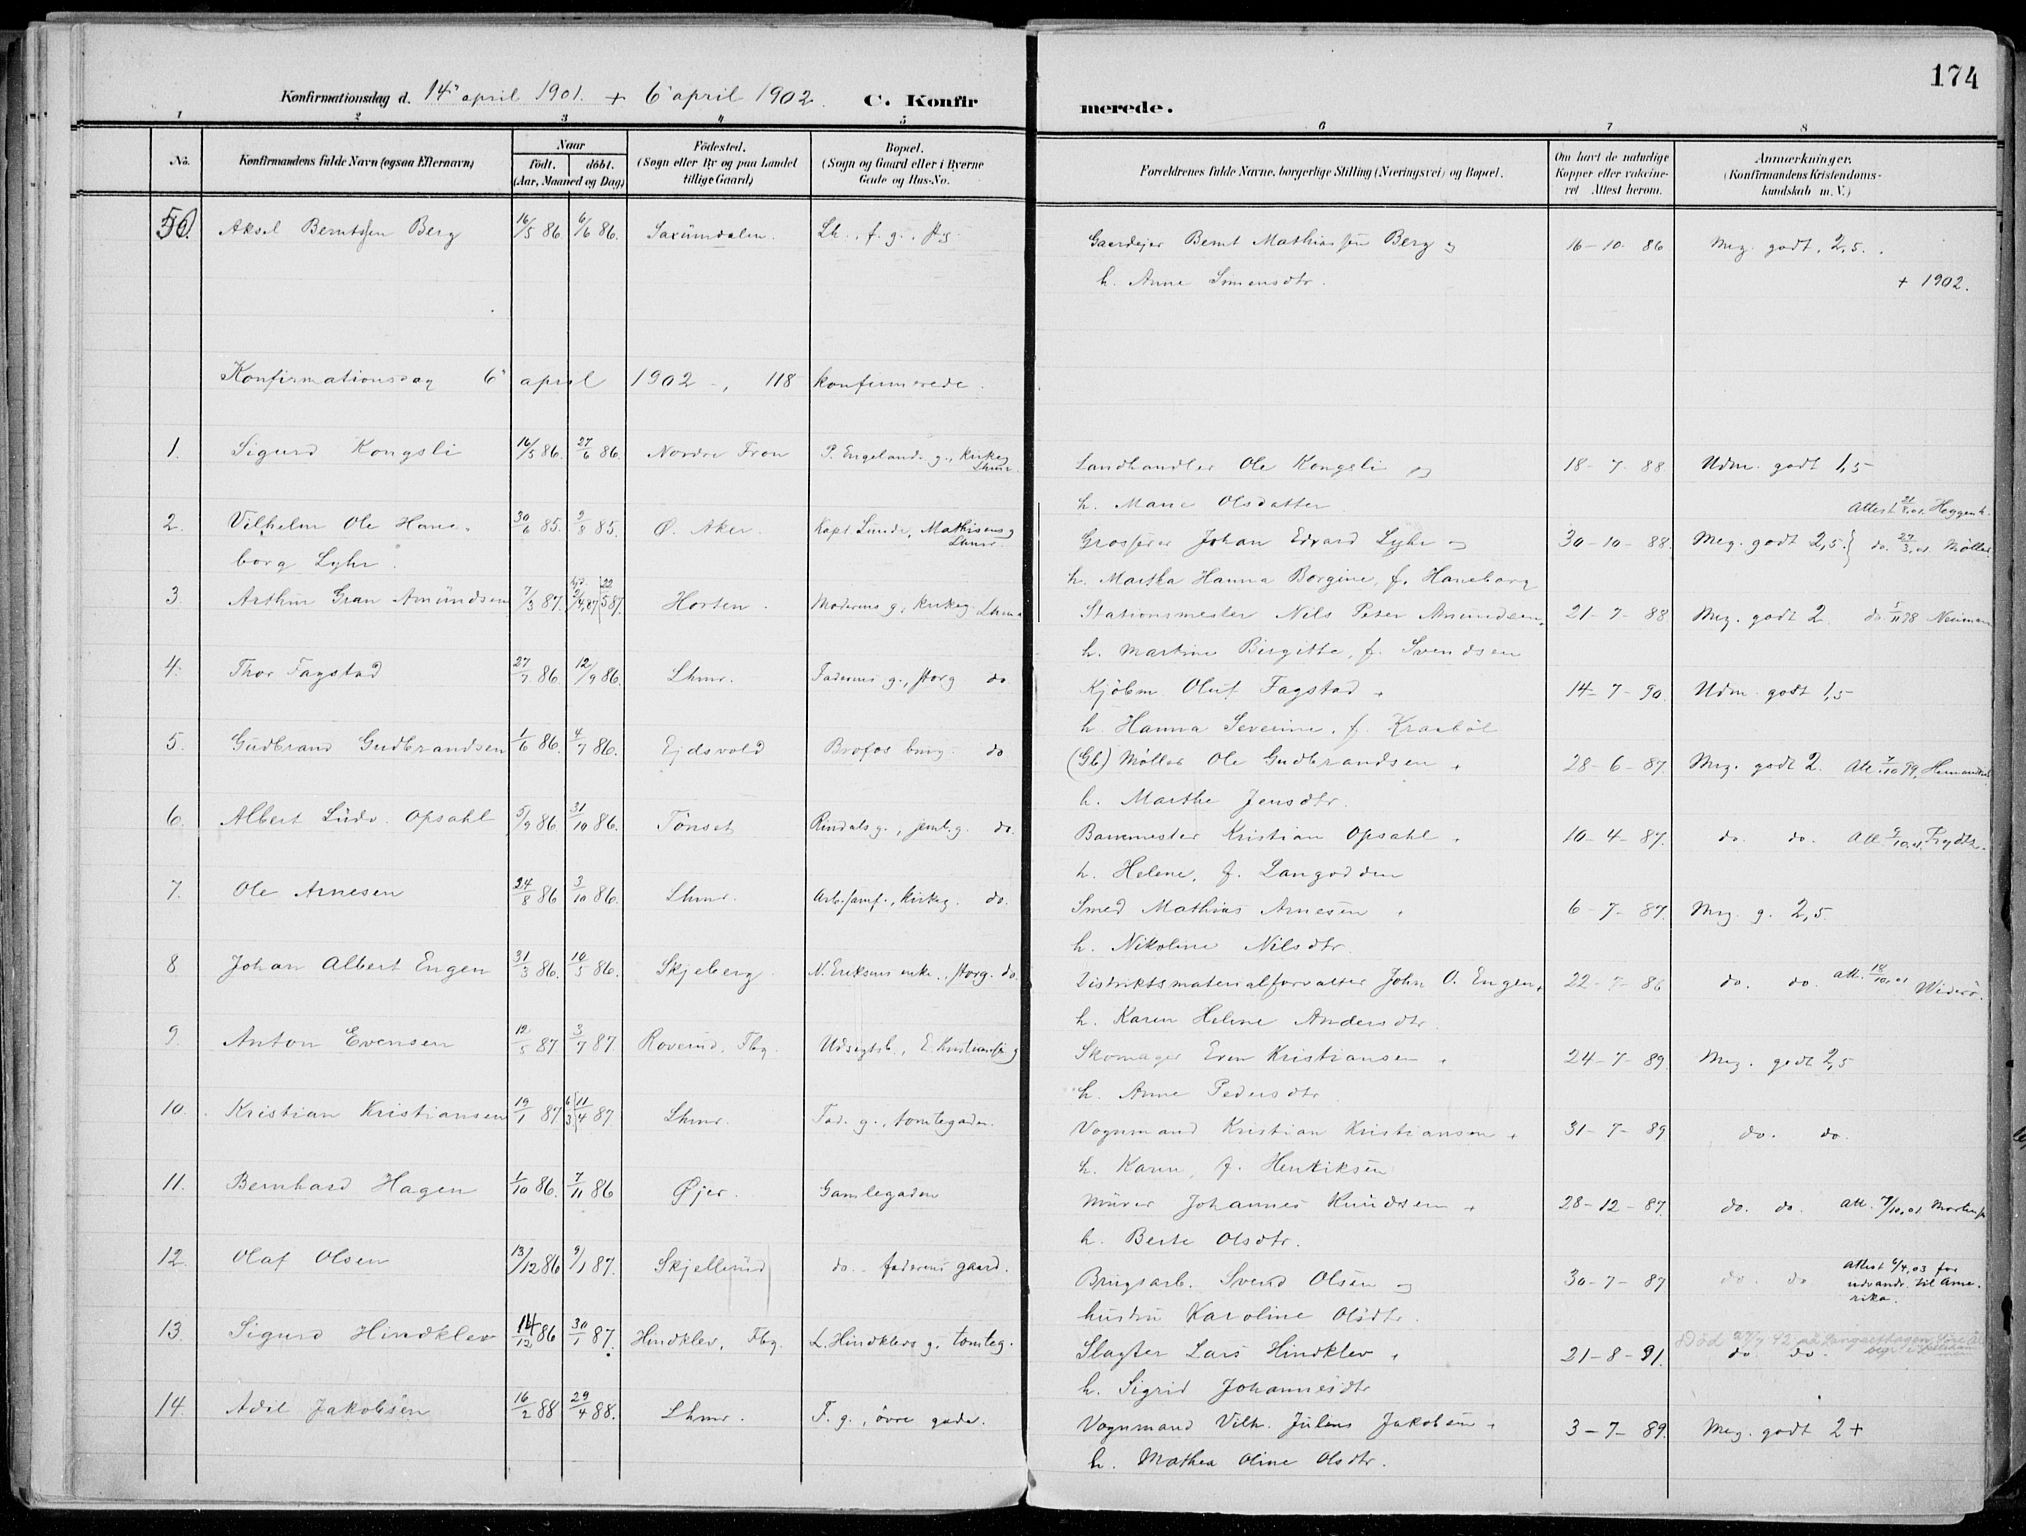 SAH, Lillehammer prestekontor, Ministerialbok nr. 1, 1901-1916, s. 174